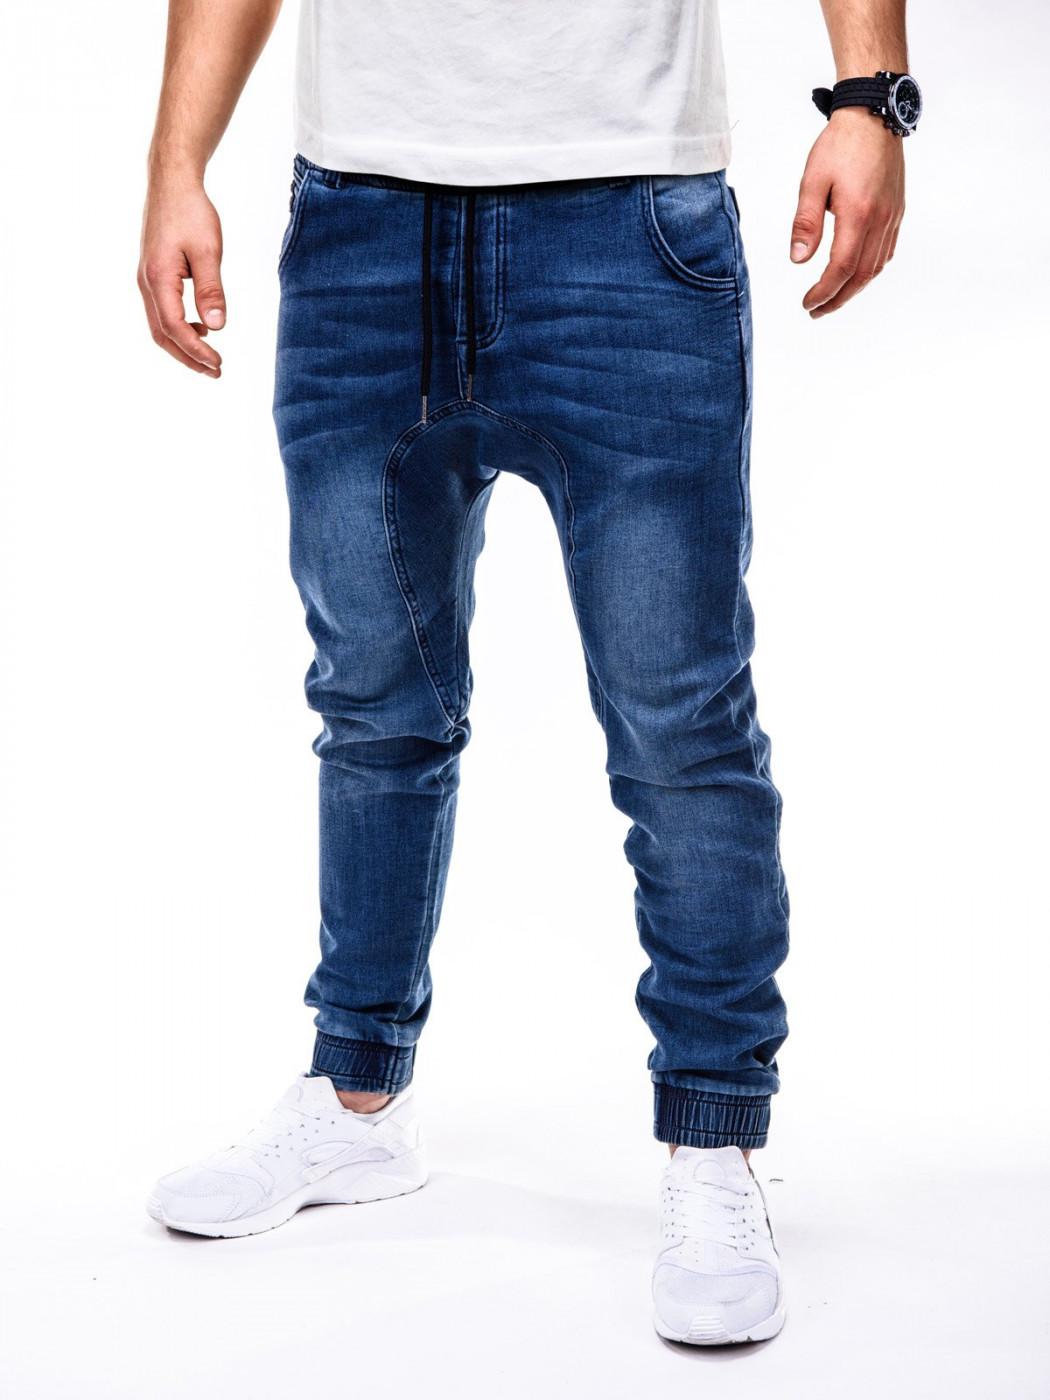 Ombre Clothing Men's jeans joggers P407